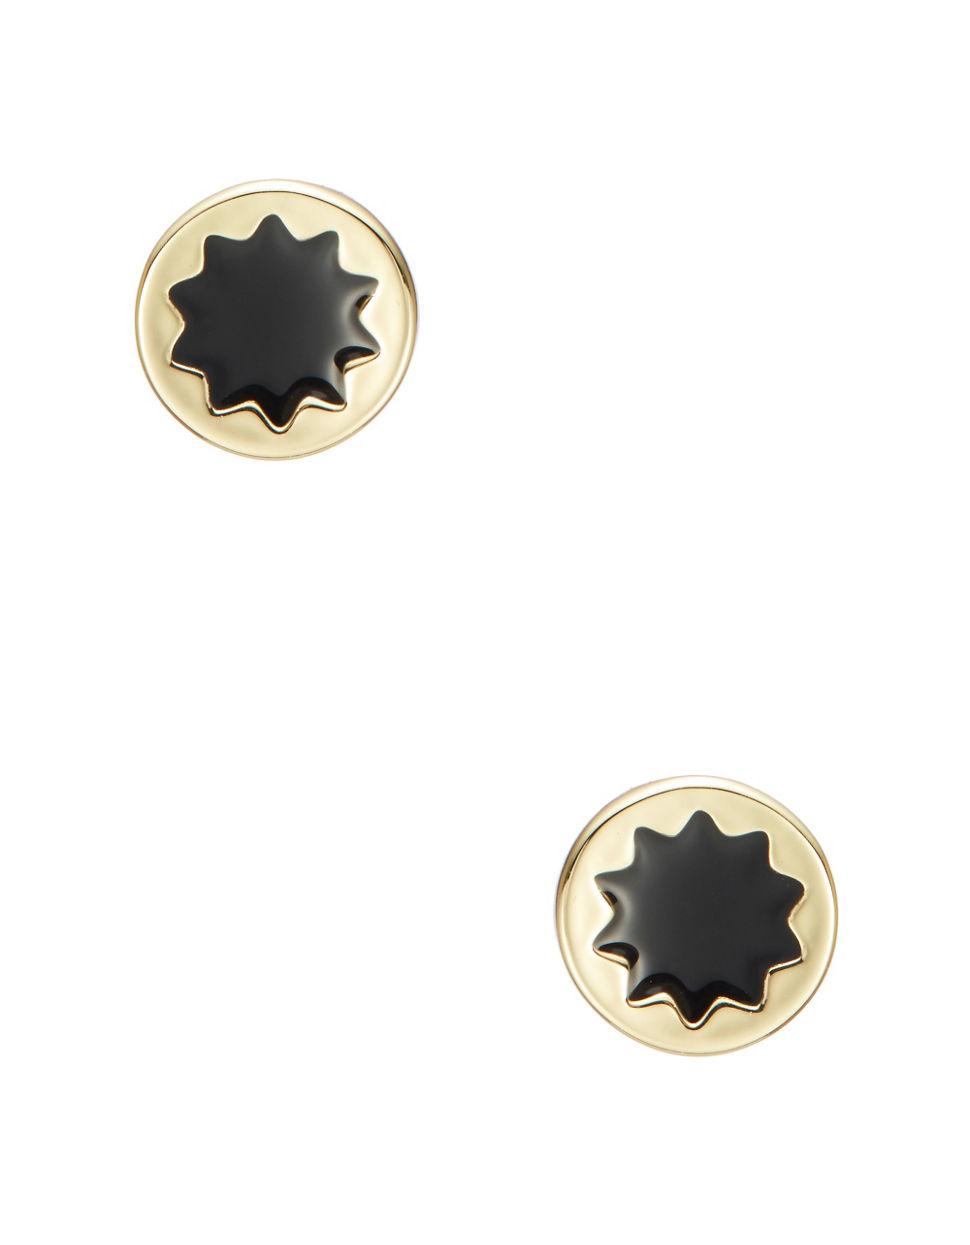 house of harlow 1960 mini sunburst stud earrings in black